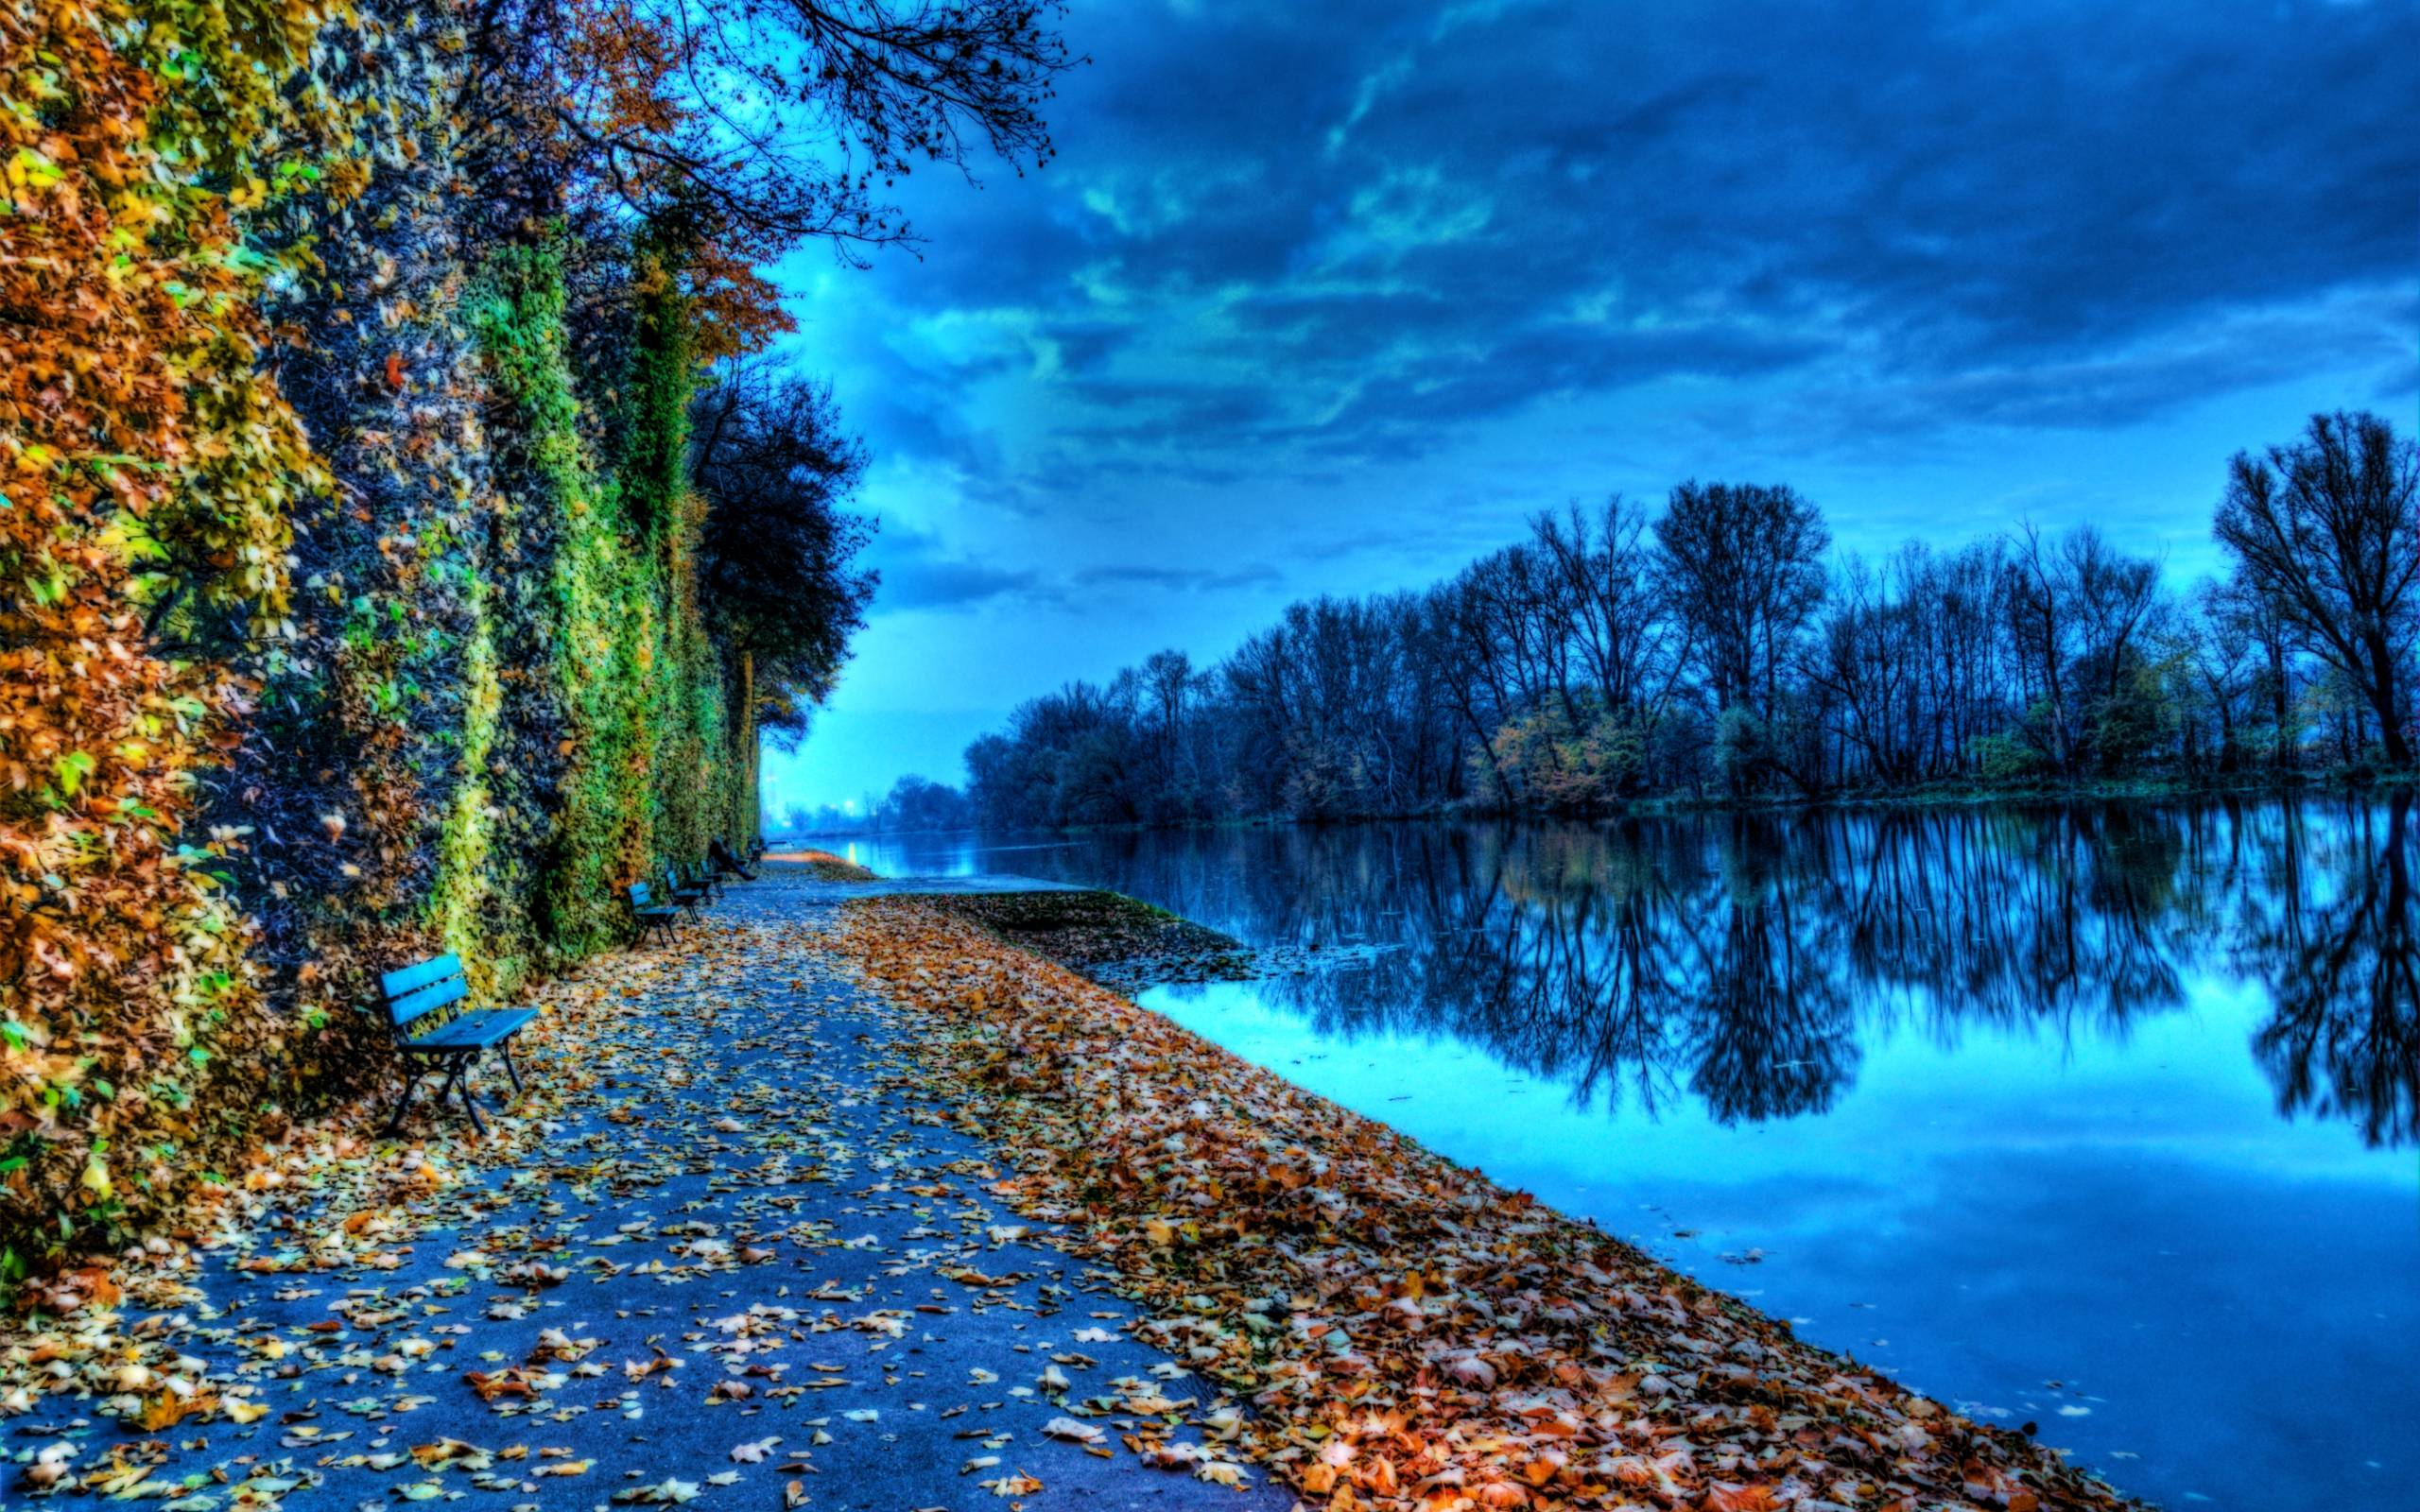 Nature Desktop Wallpaper Hd Free Download